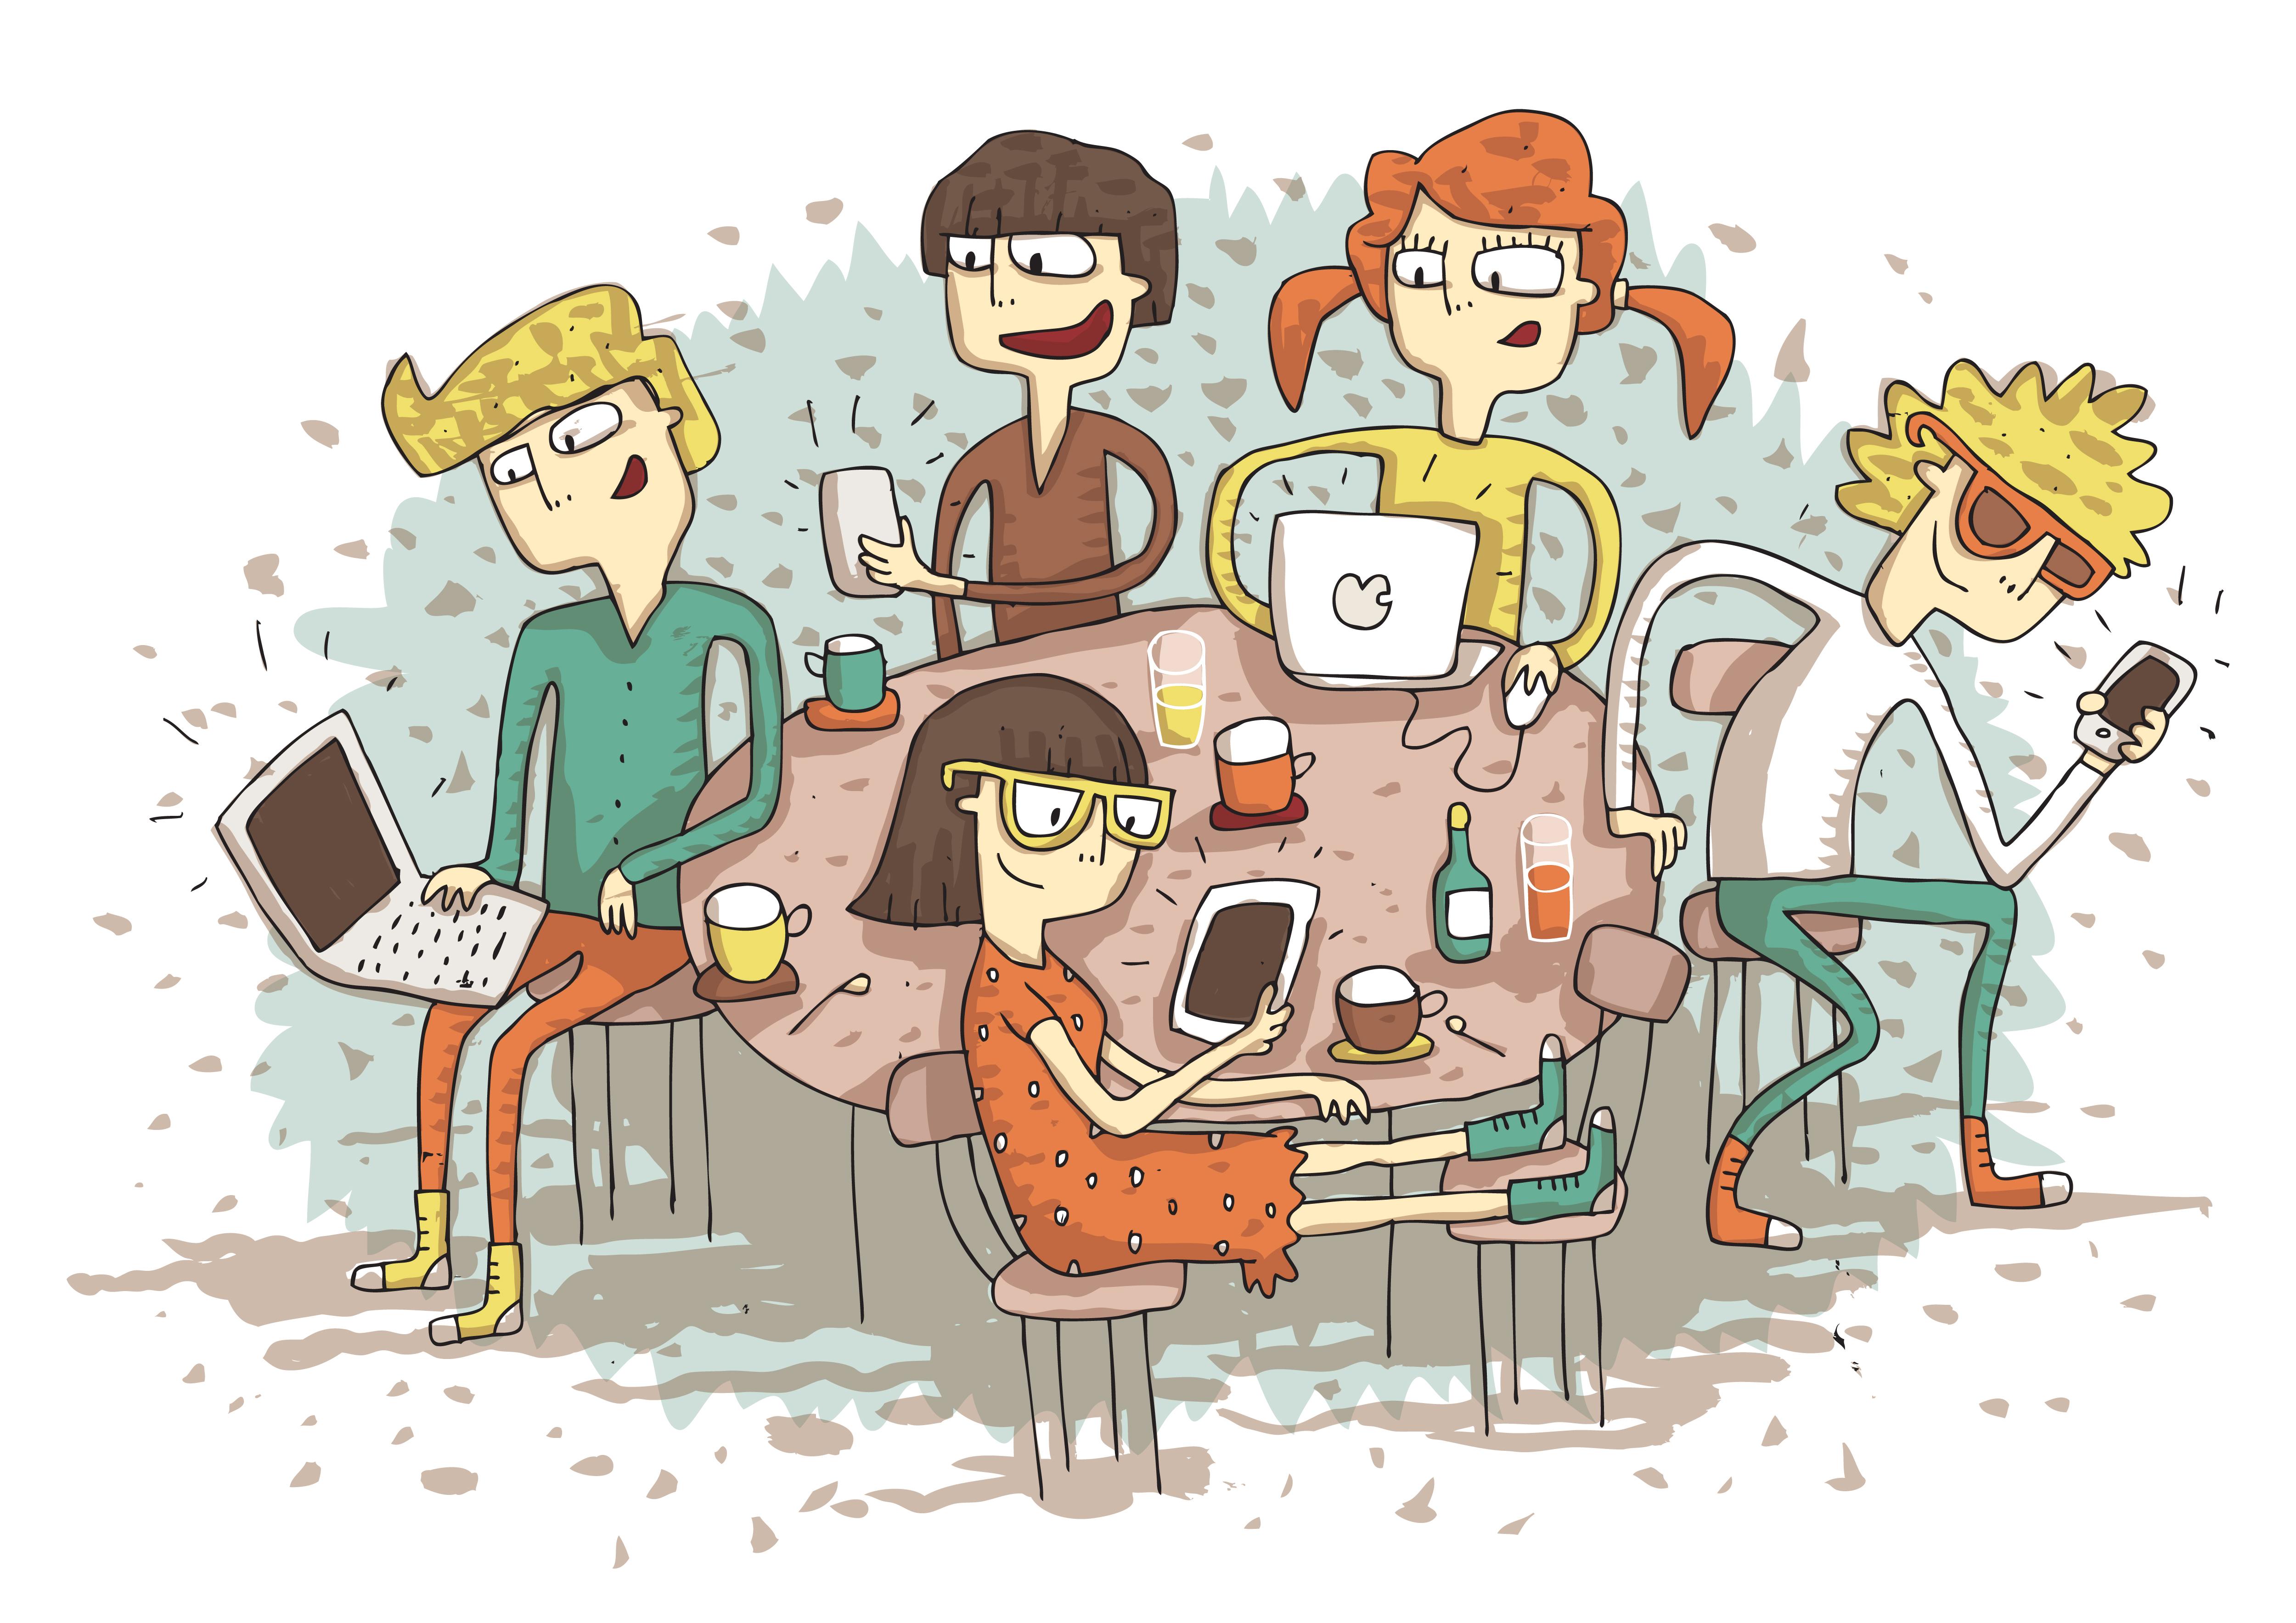 How Tech Addiction is changing Human Behavior